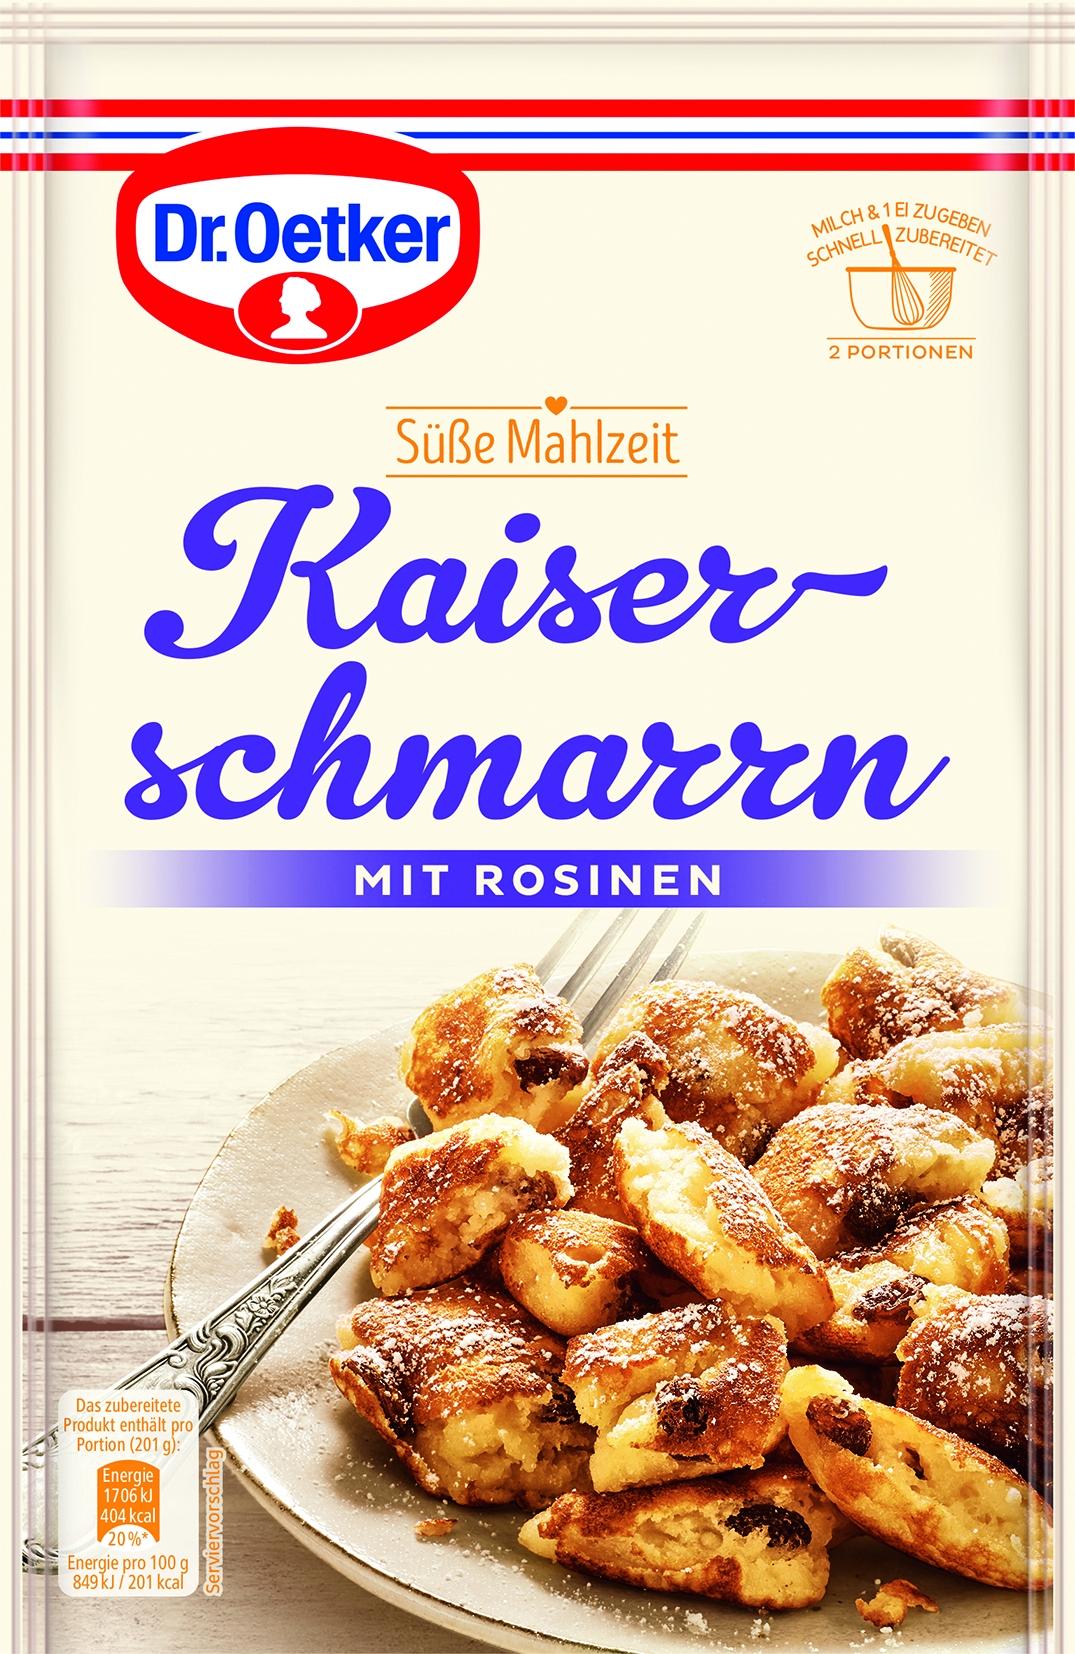 Süße Mahlzeit Kaiserschmarn